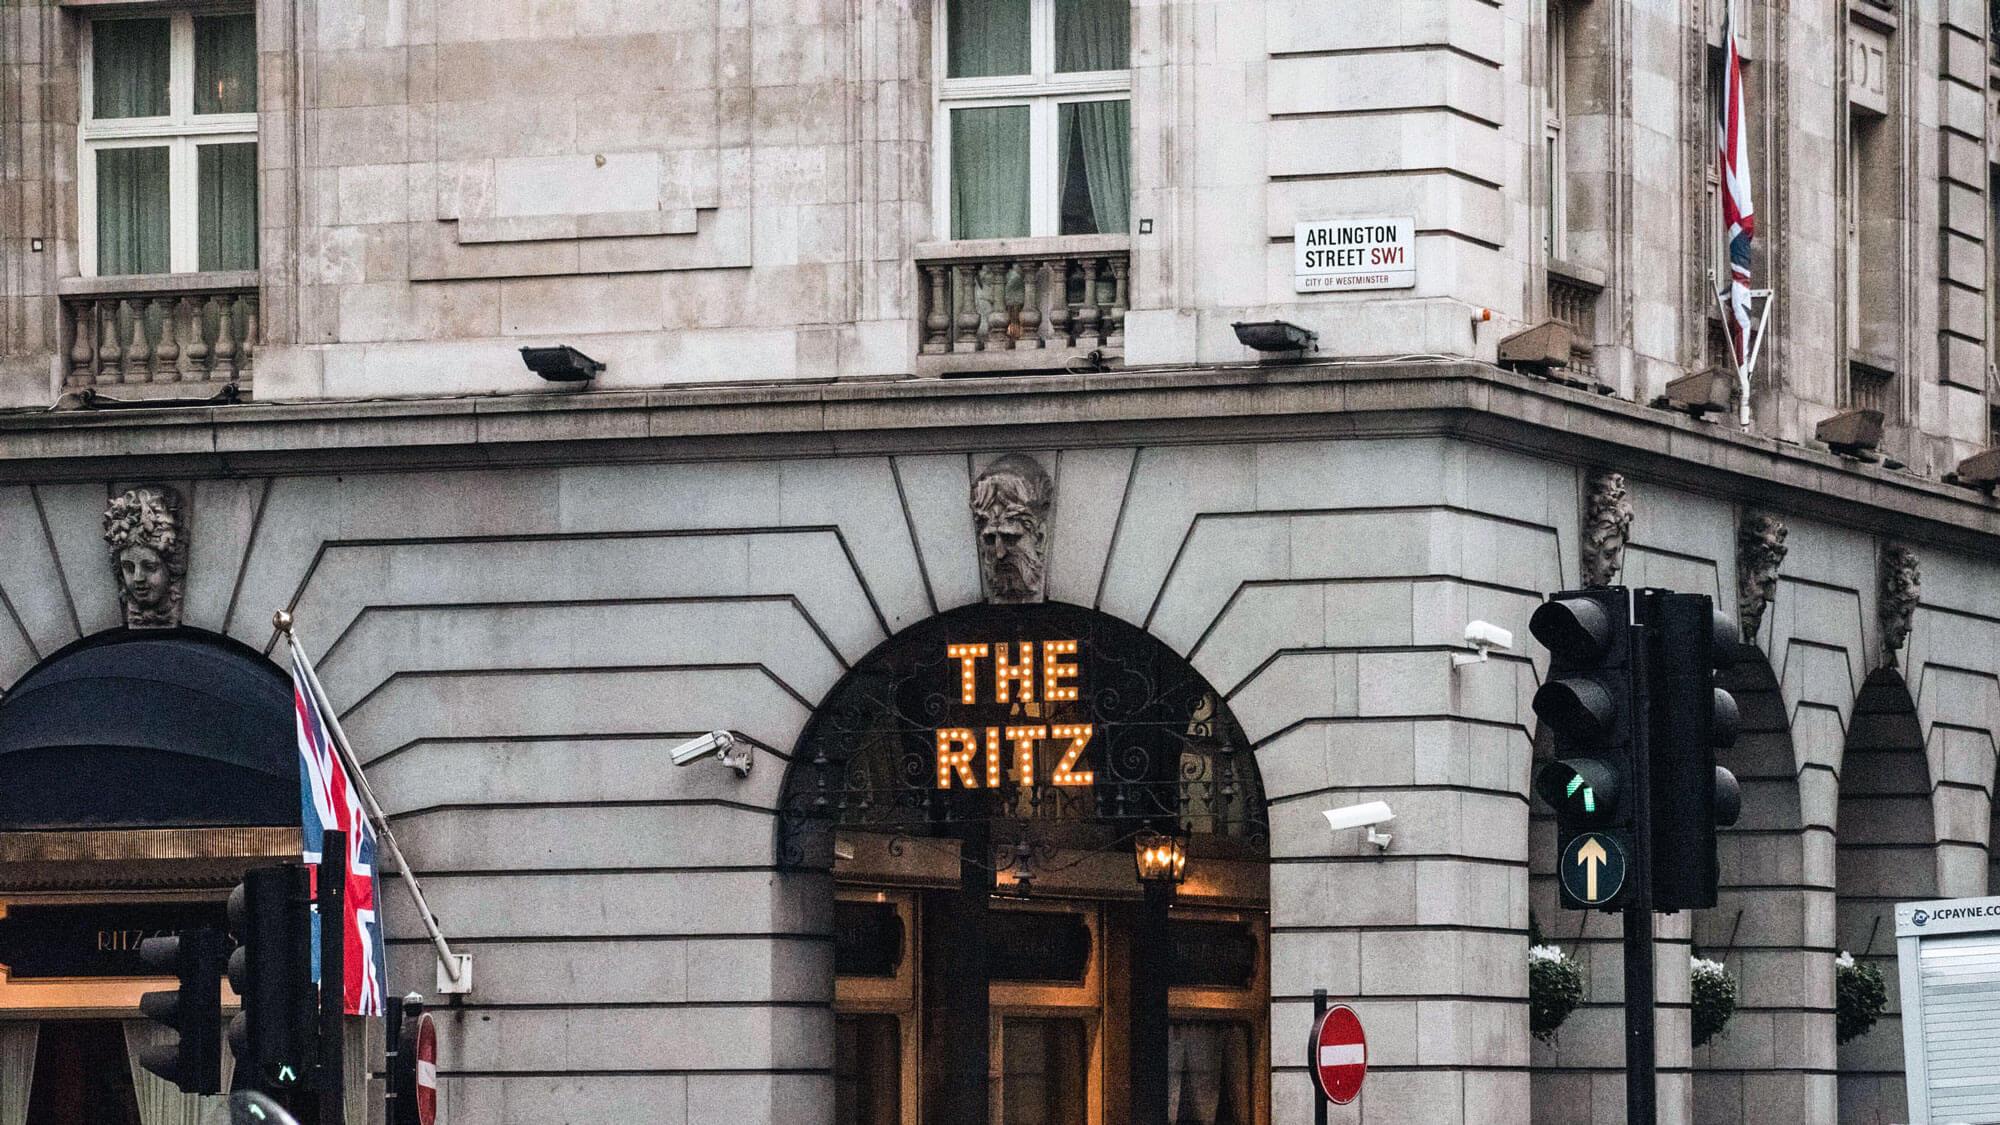 A Ritz hotel